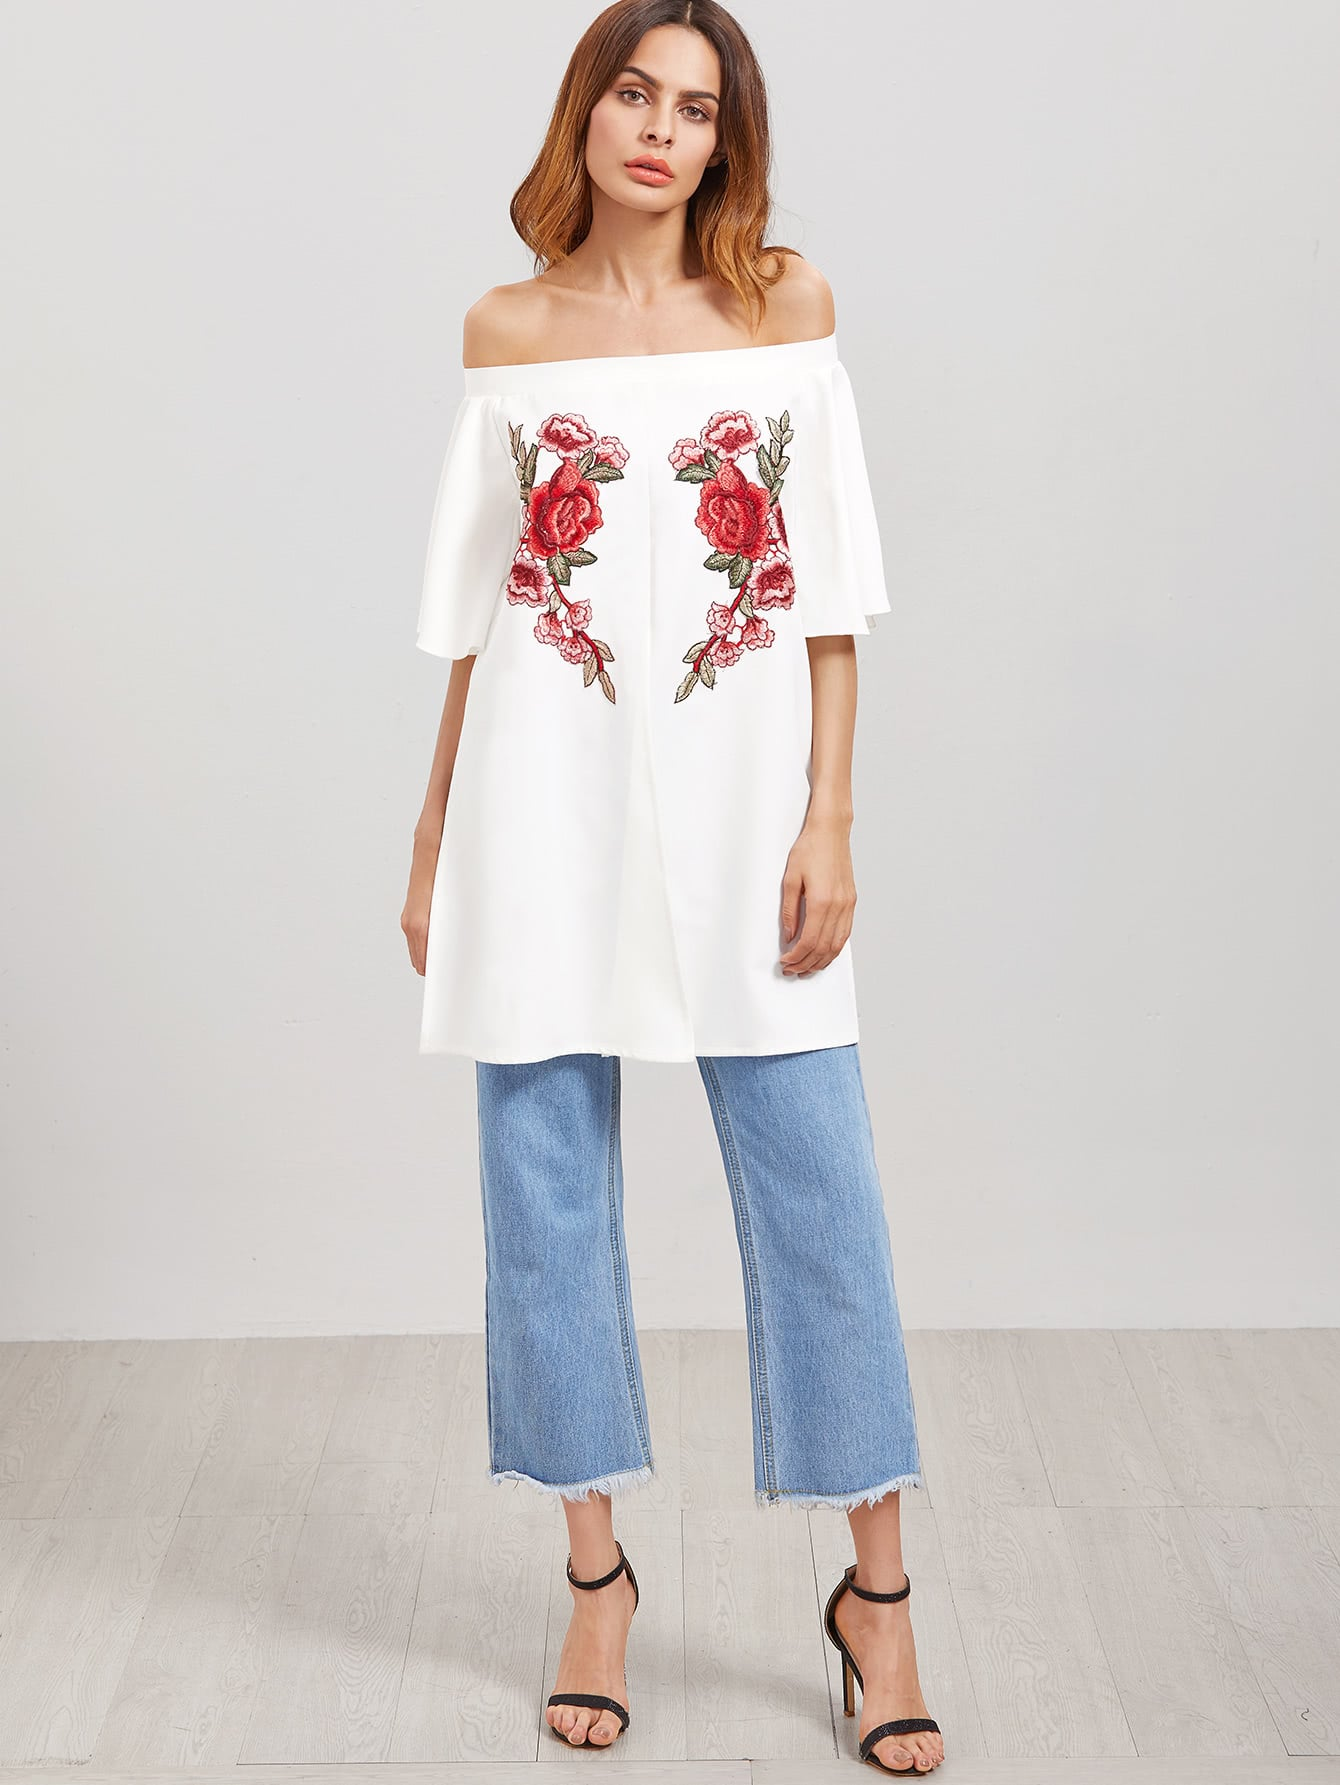 blouse161227708_2